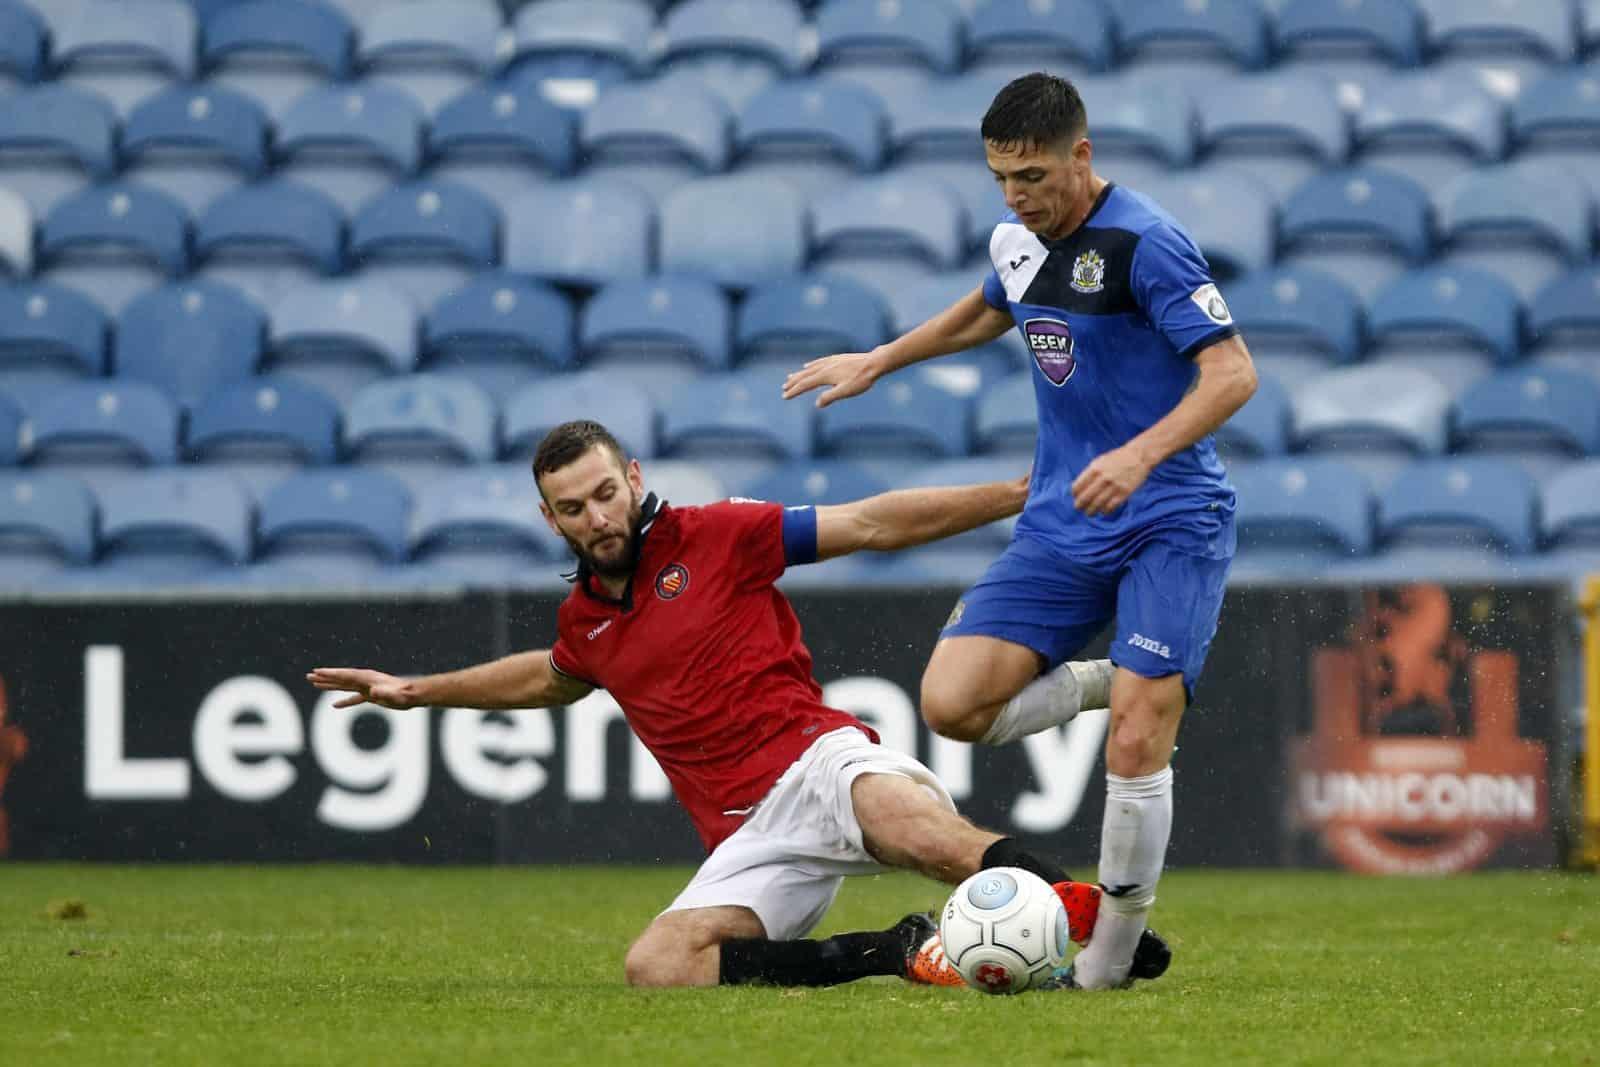 Scott Duxbury, Stockport County 3-3 FC United 30.9.17